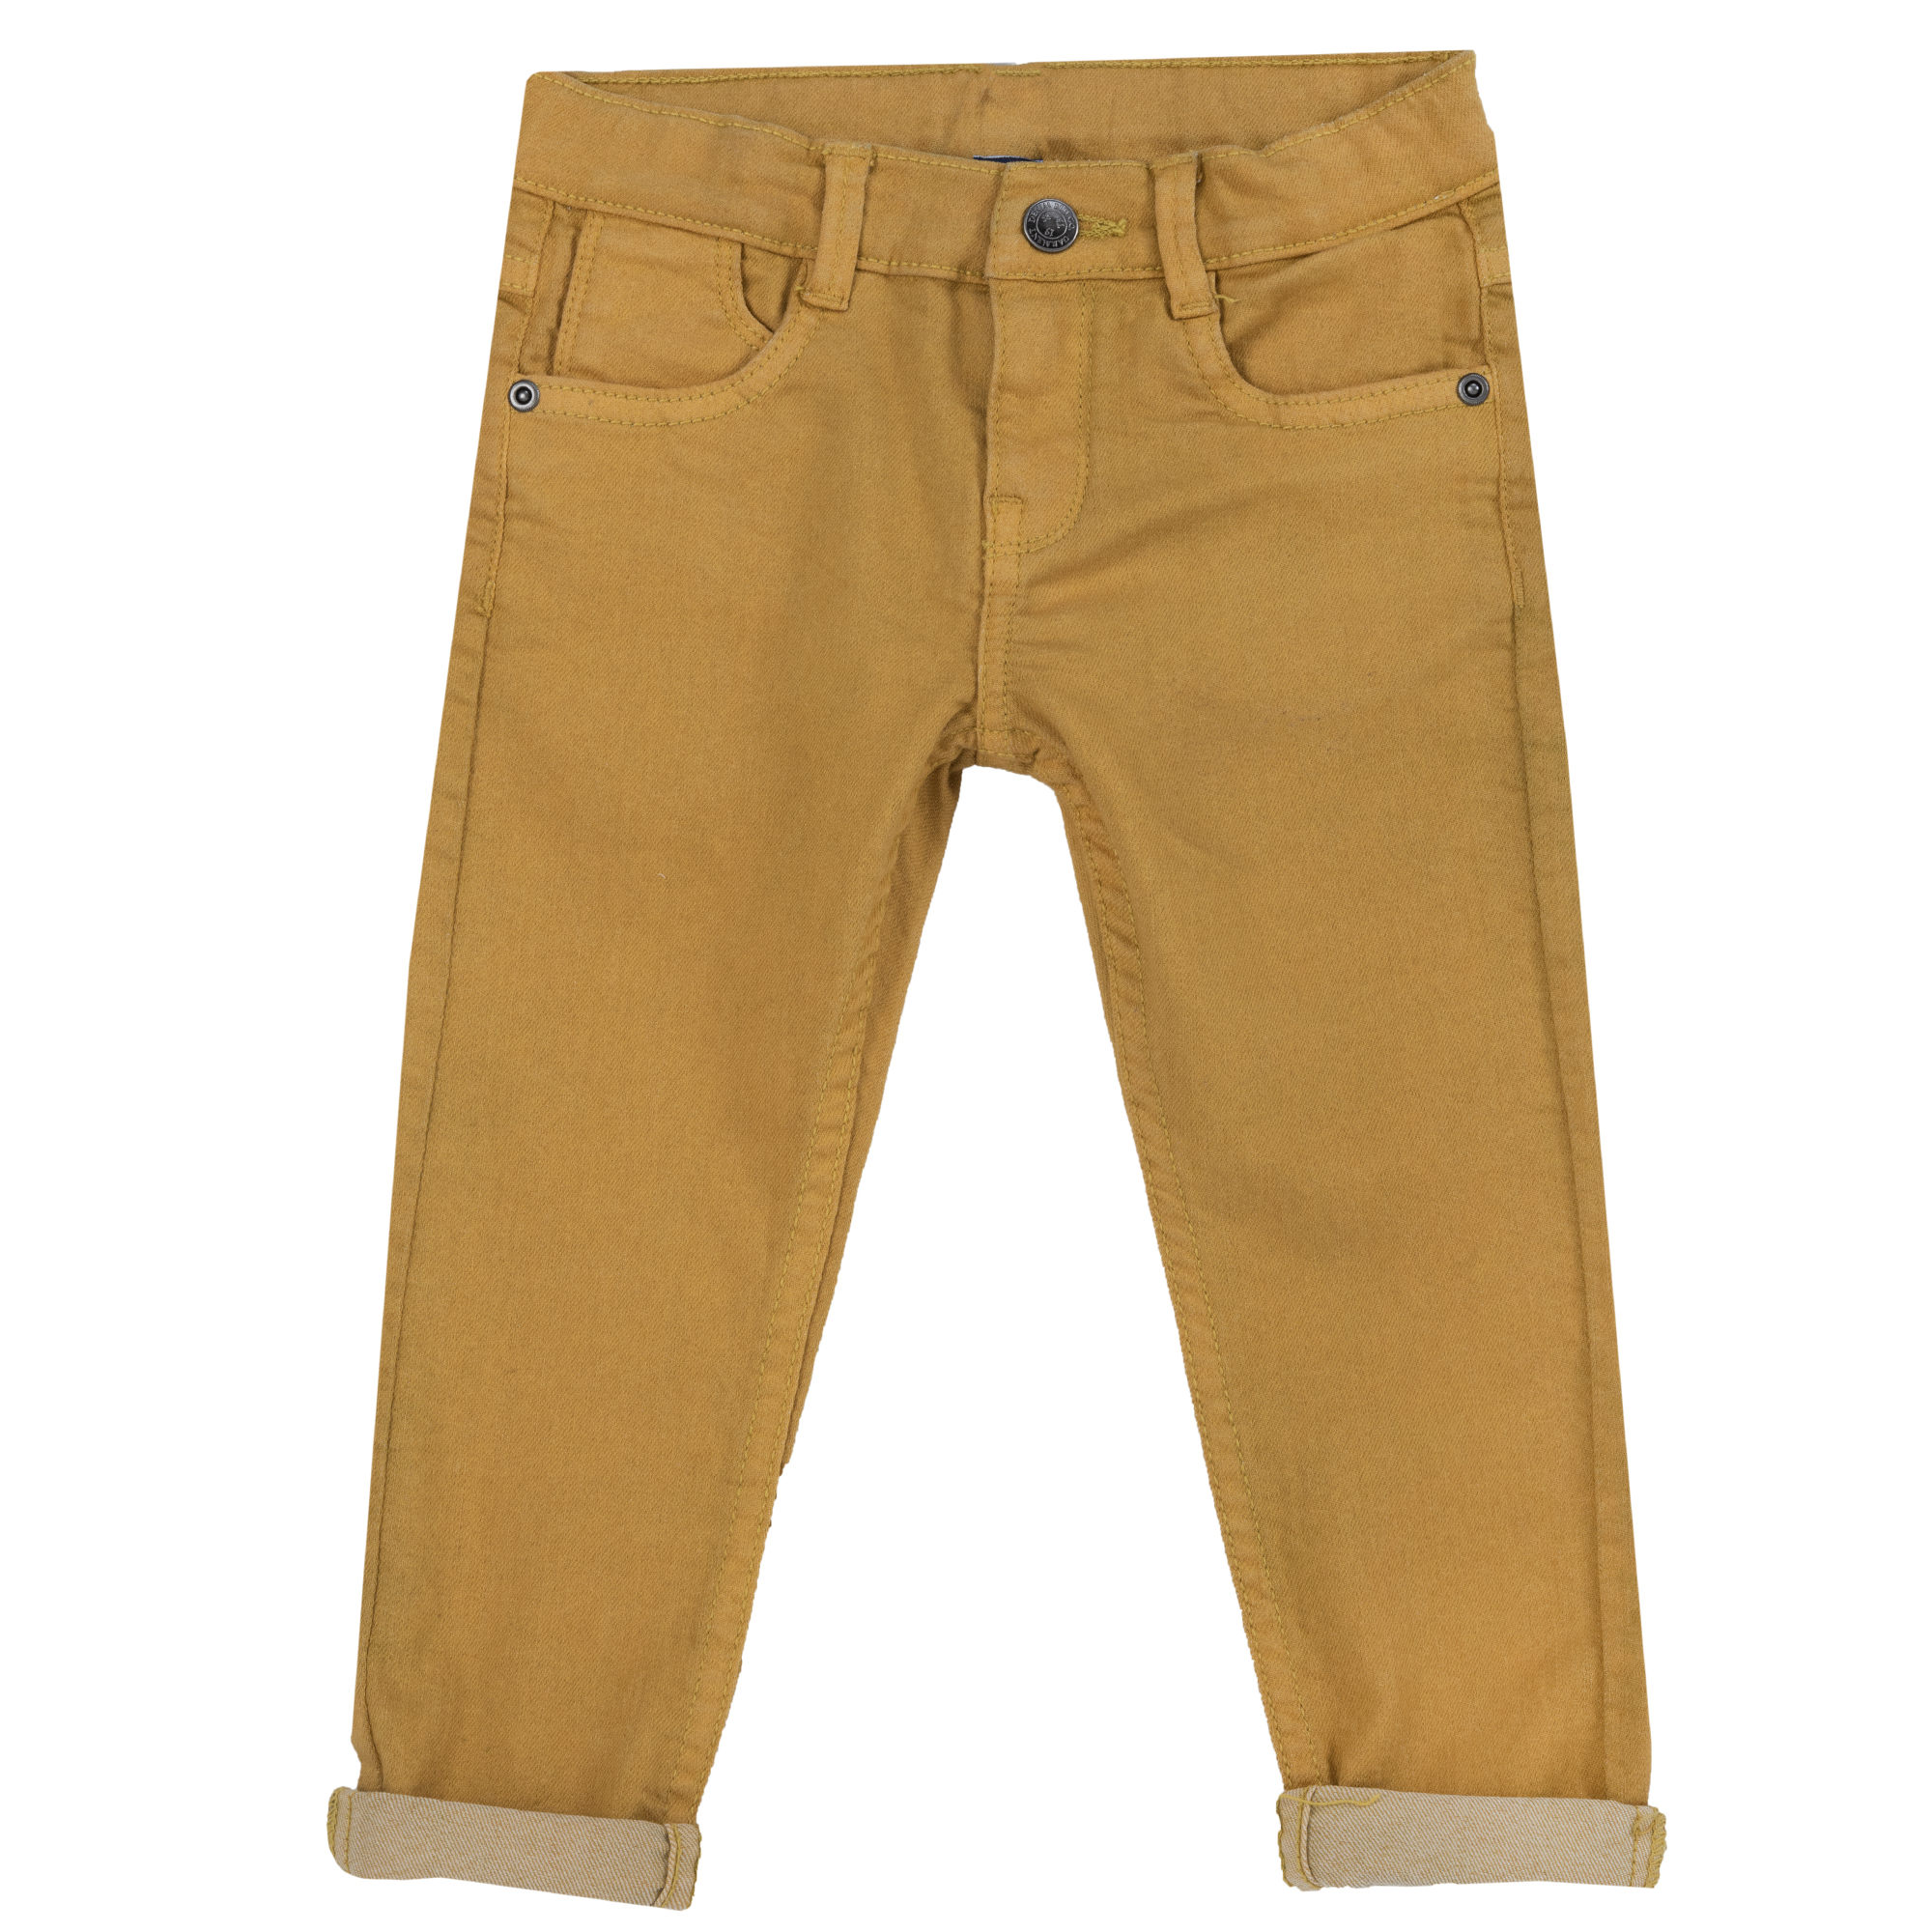 Pantalon Lung Copii Chicco, Galben, 08272 imagine